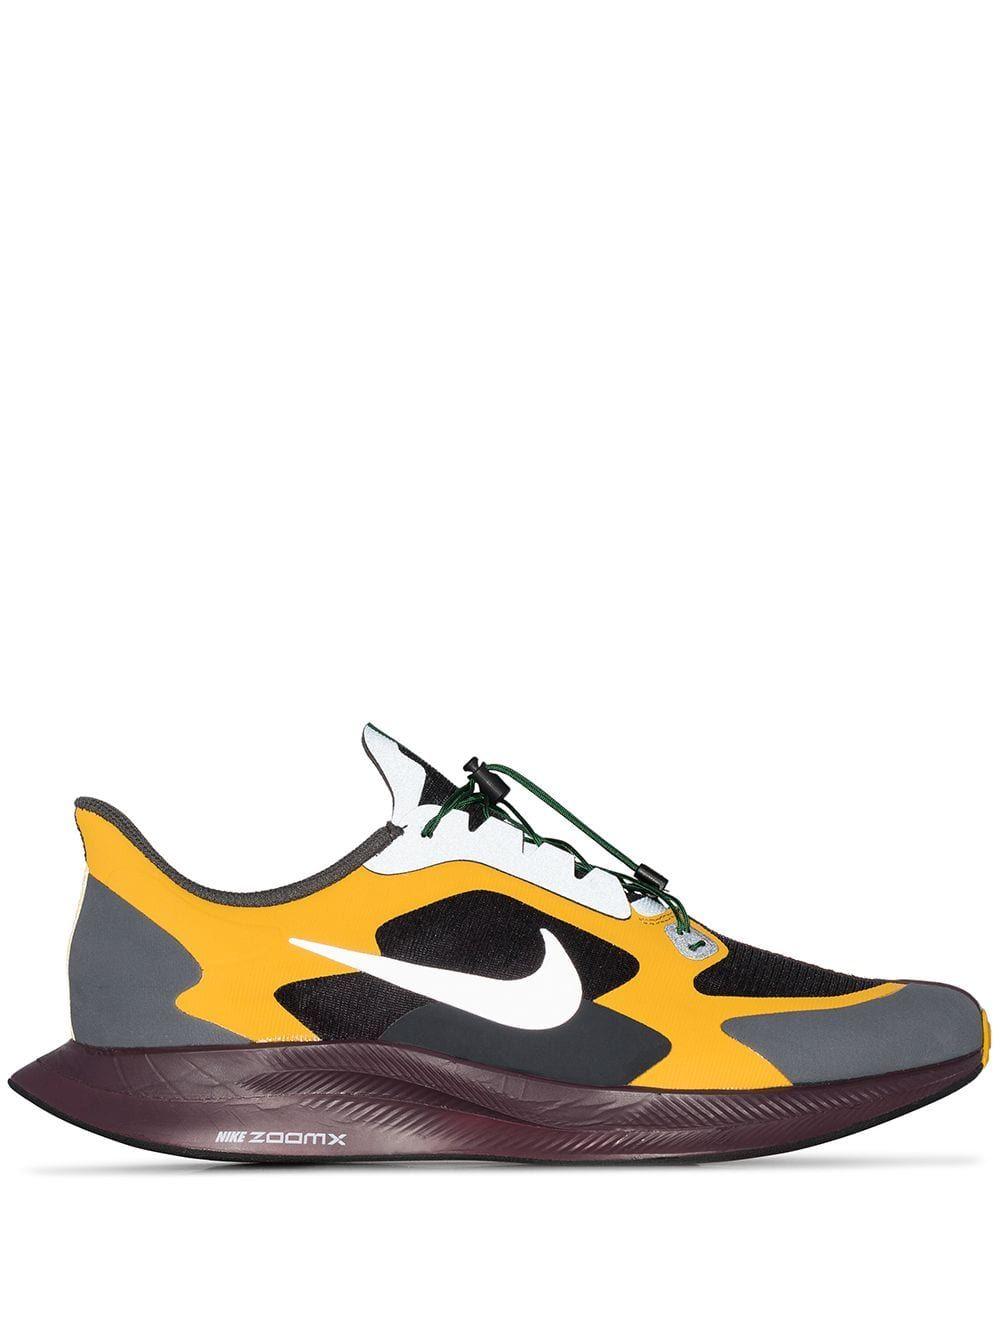 cortex scarpe nike